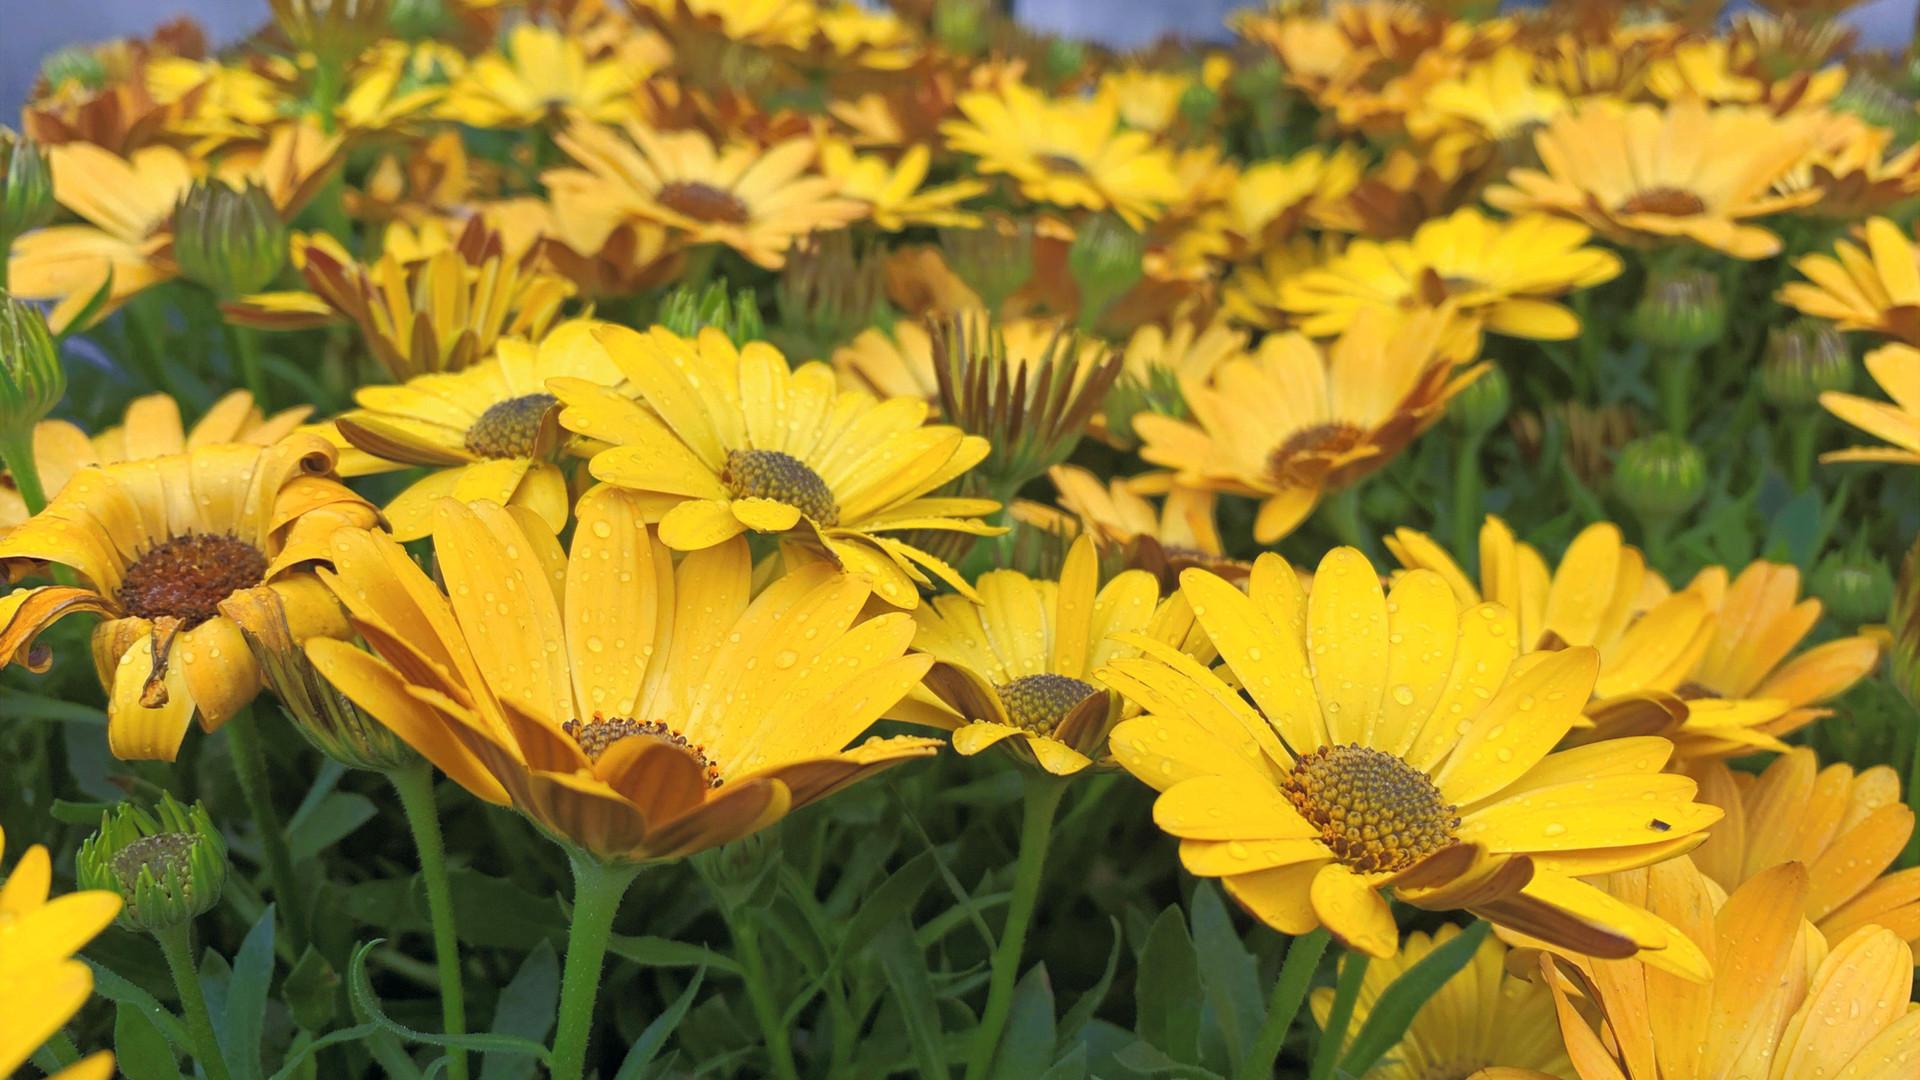 flowers_edited_edited_edited_edited.jpg